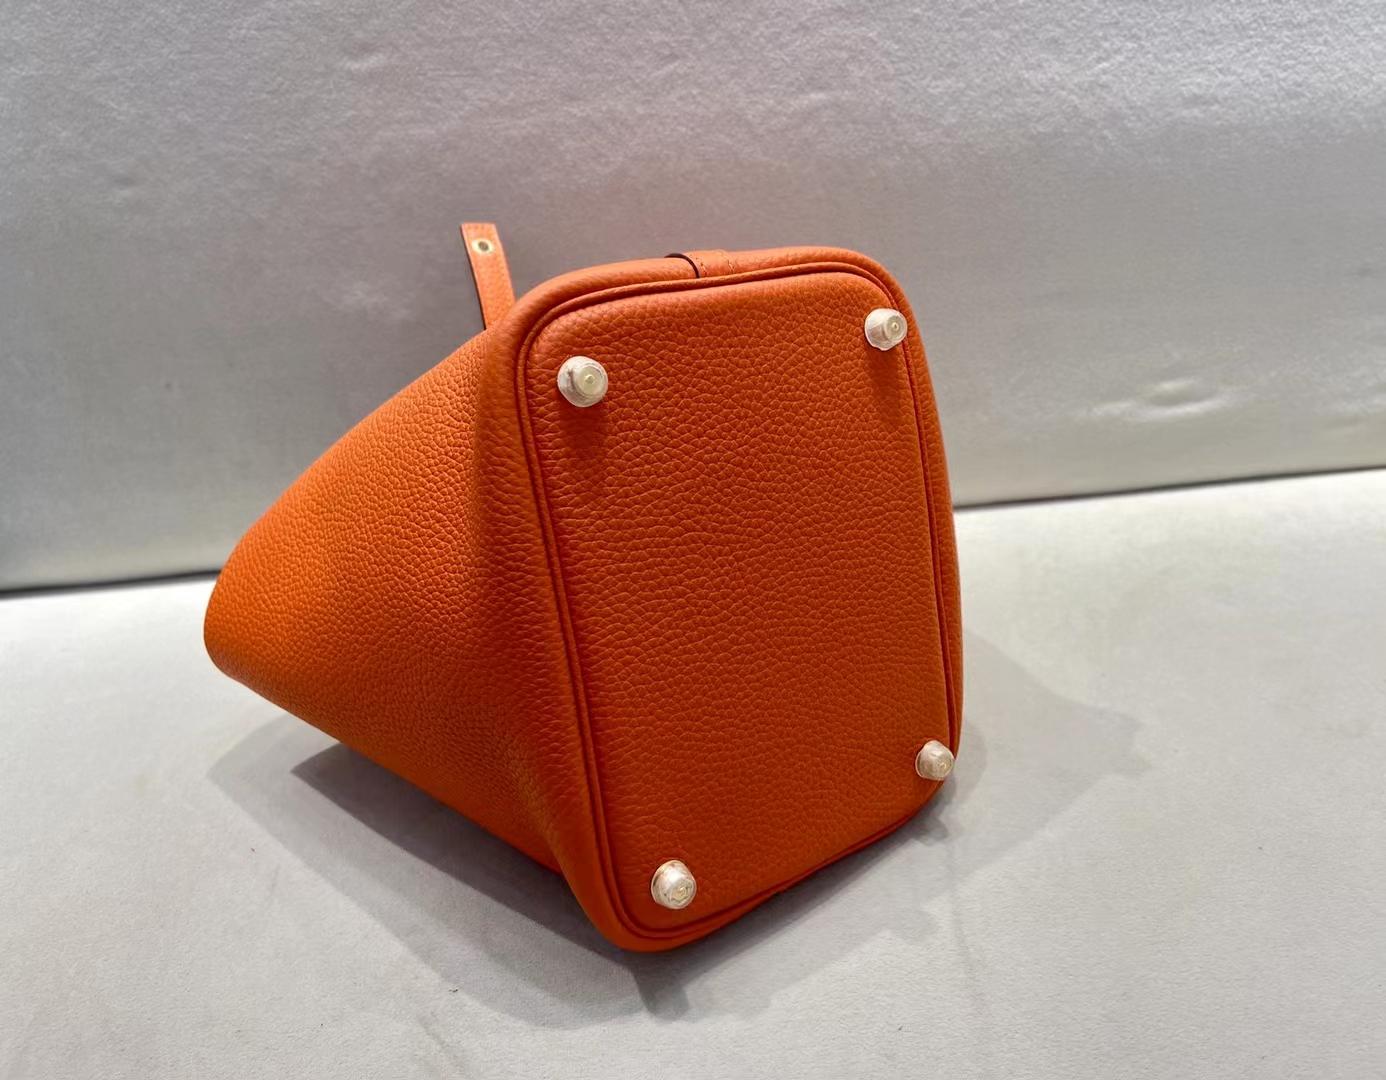 Hermès(爱马仕)Picotin 菜篮子 TC 经典橙 金扣 18cm 顶级纯手工